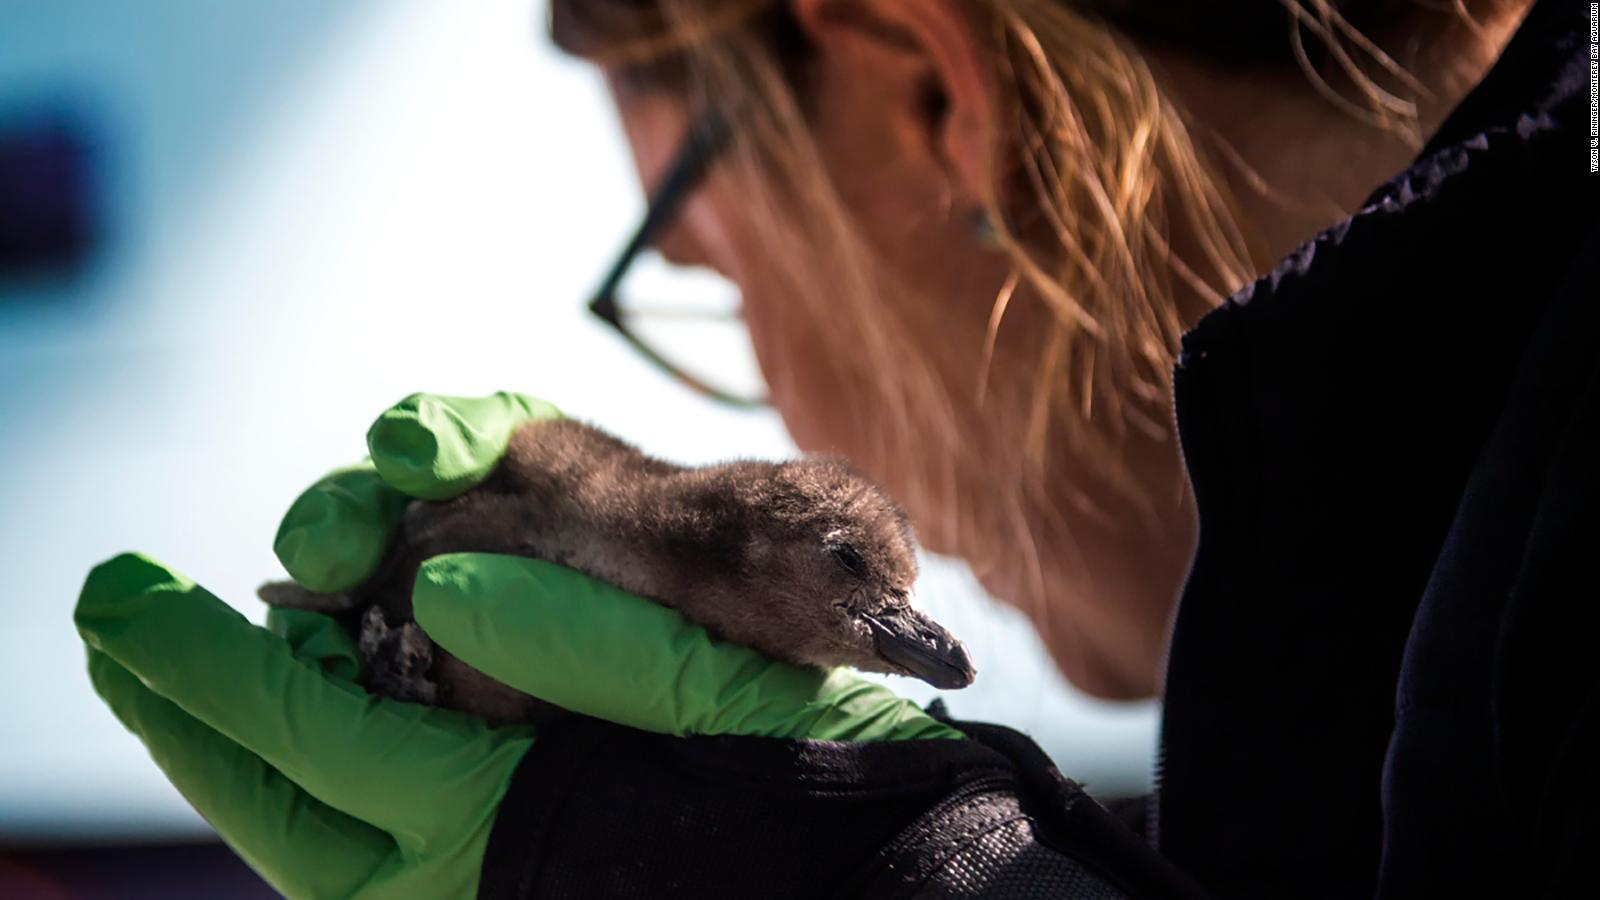 monterey bay aquarium needs a name for its new penguin chick cnn